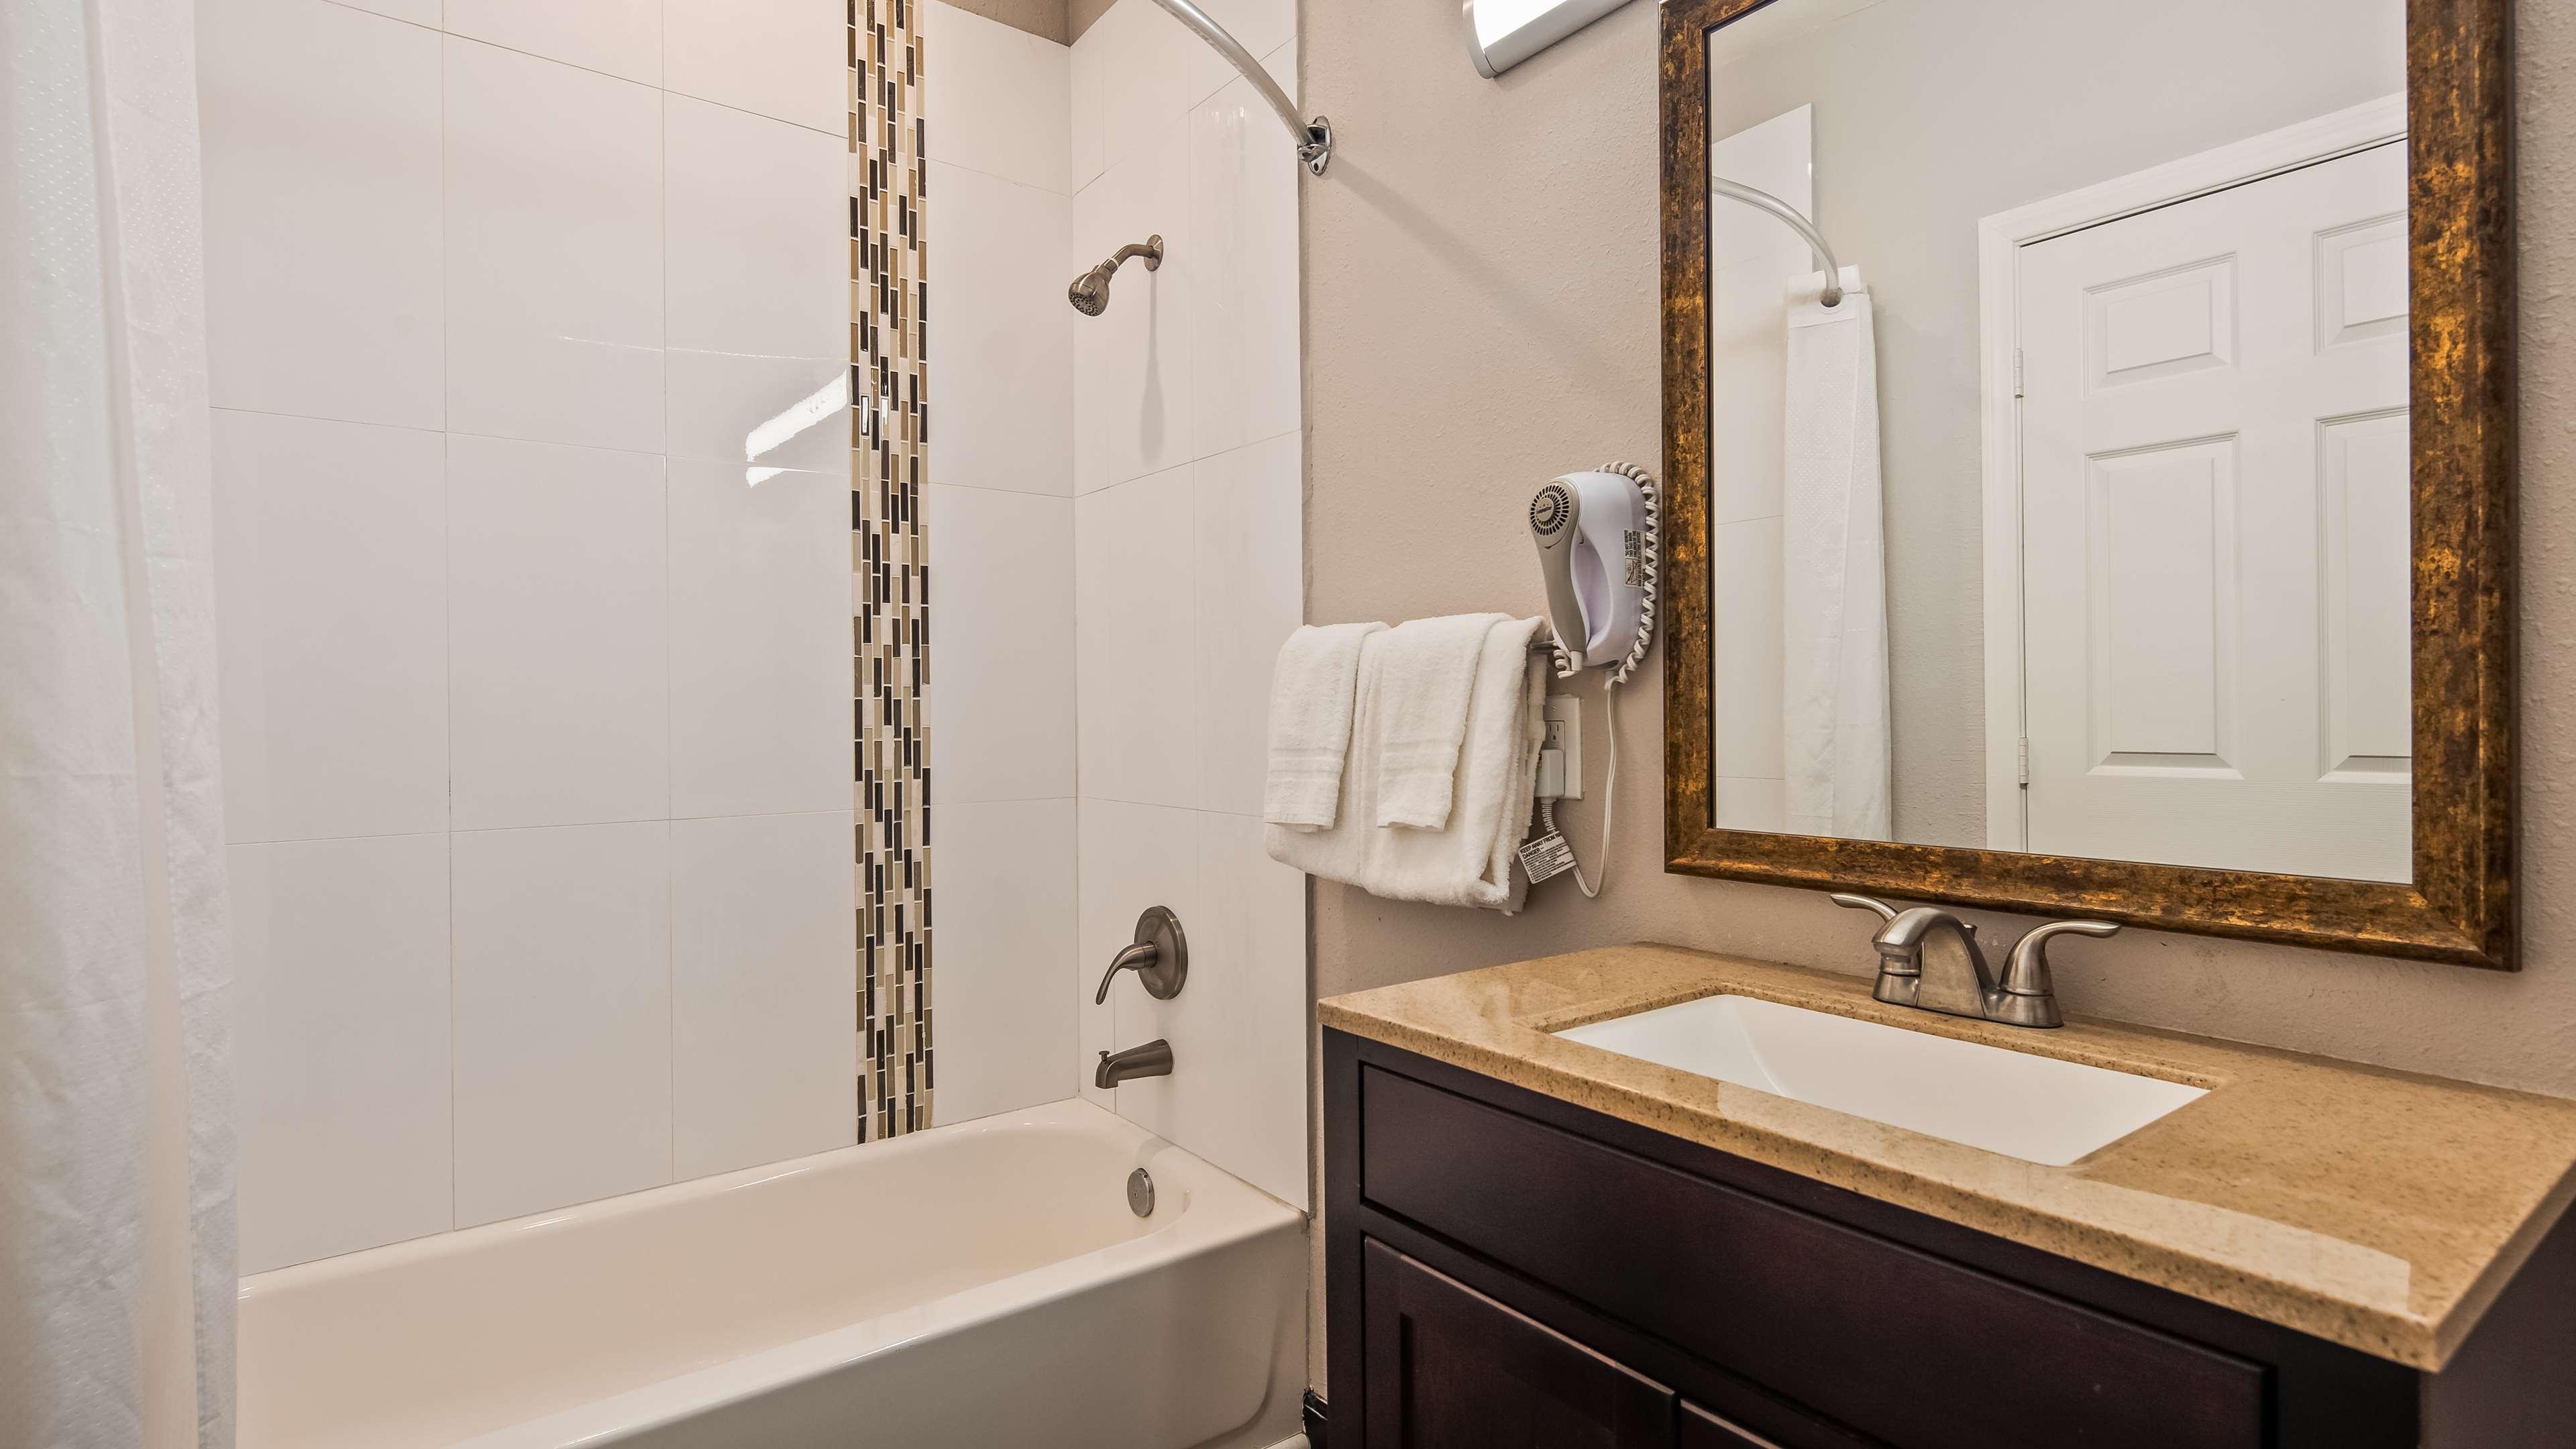 SureStay Hotel by Best Western Ridgecrest image 9